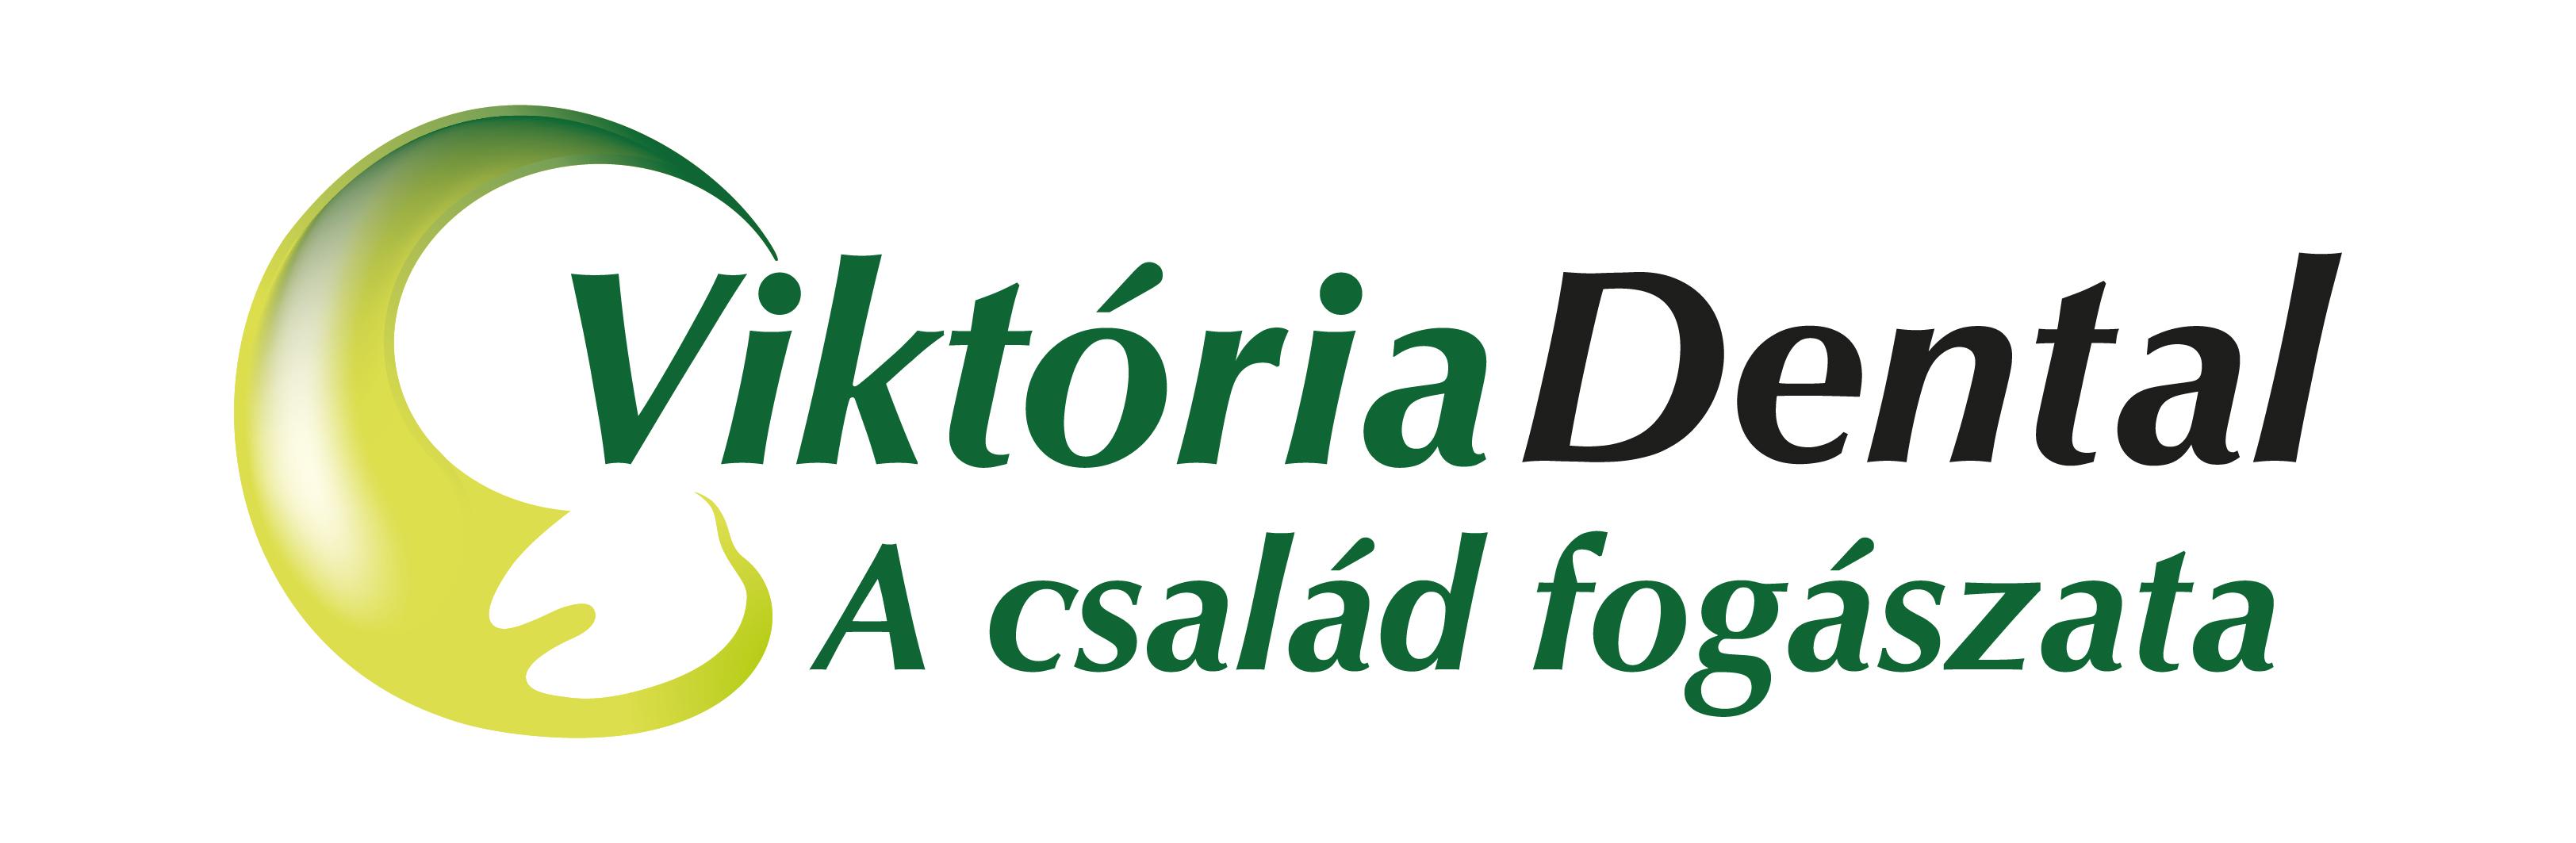 viktoriadental Logo